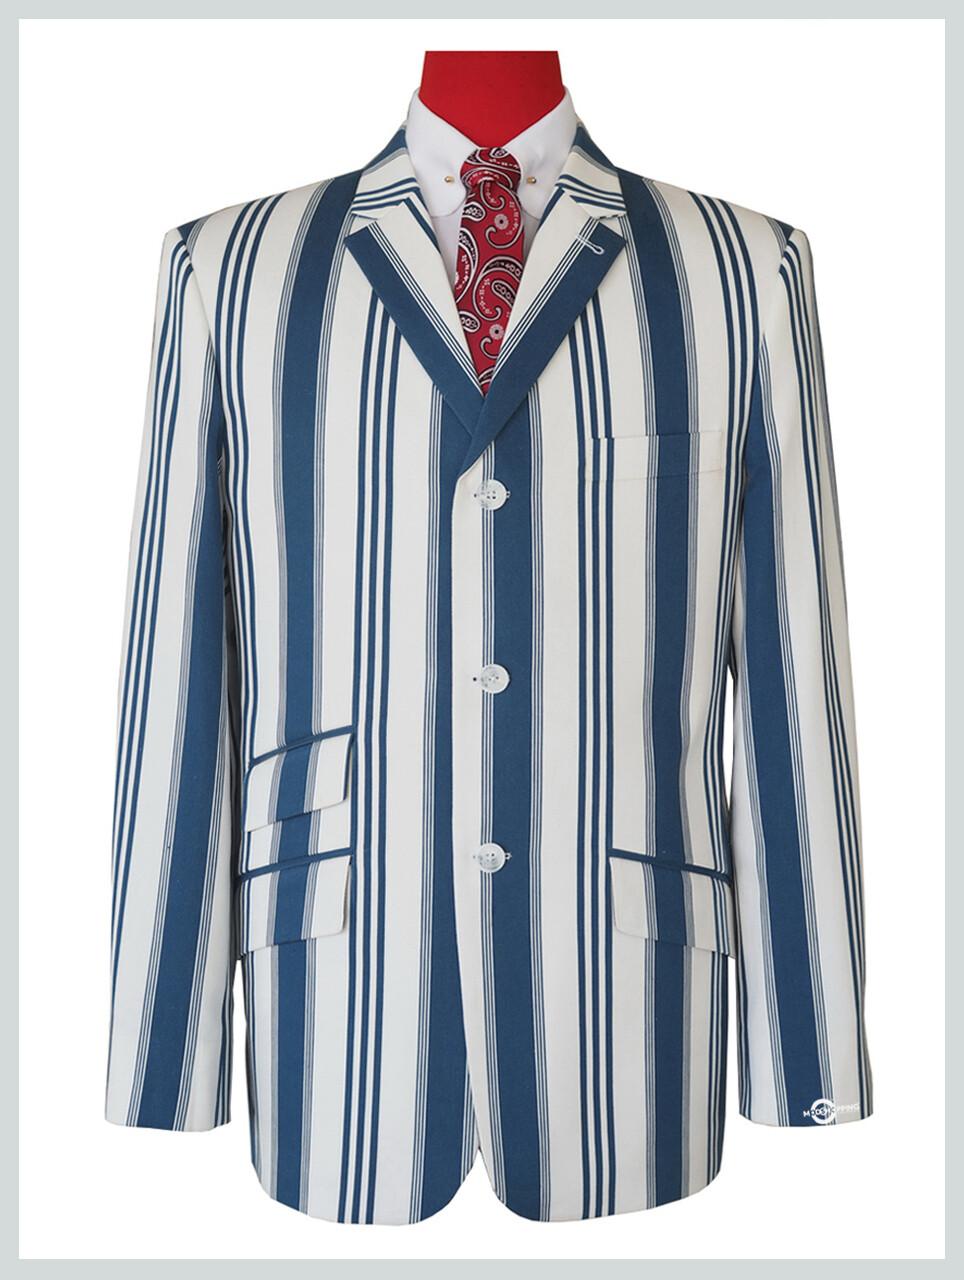 Blue striped white blazer 60s mod fashion tailored 3 buttons blazer jacket